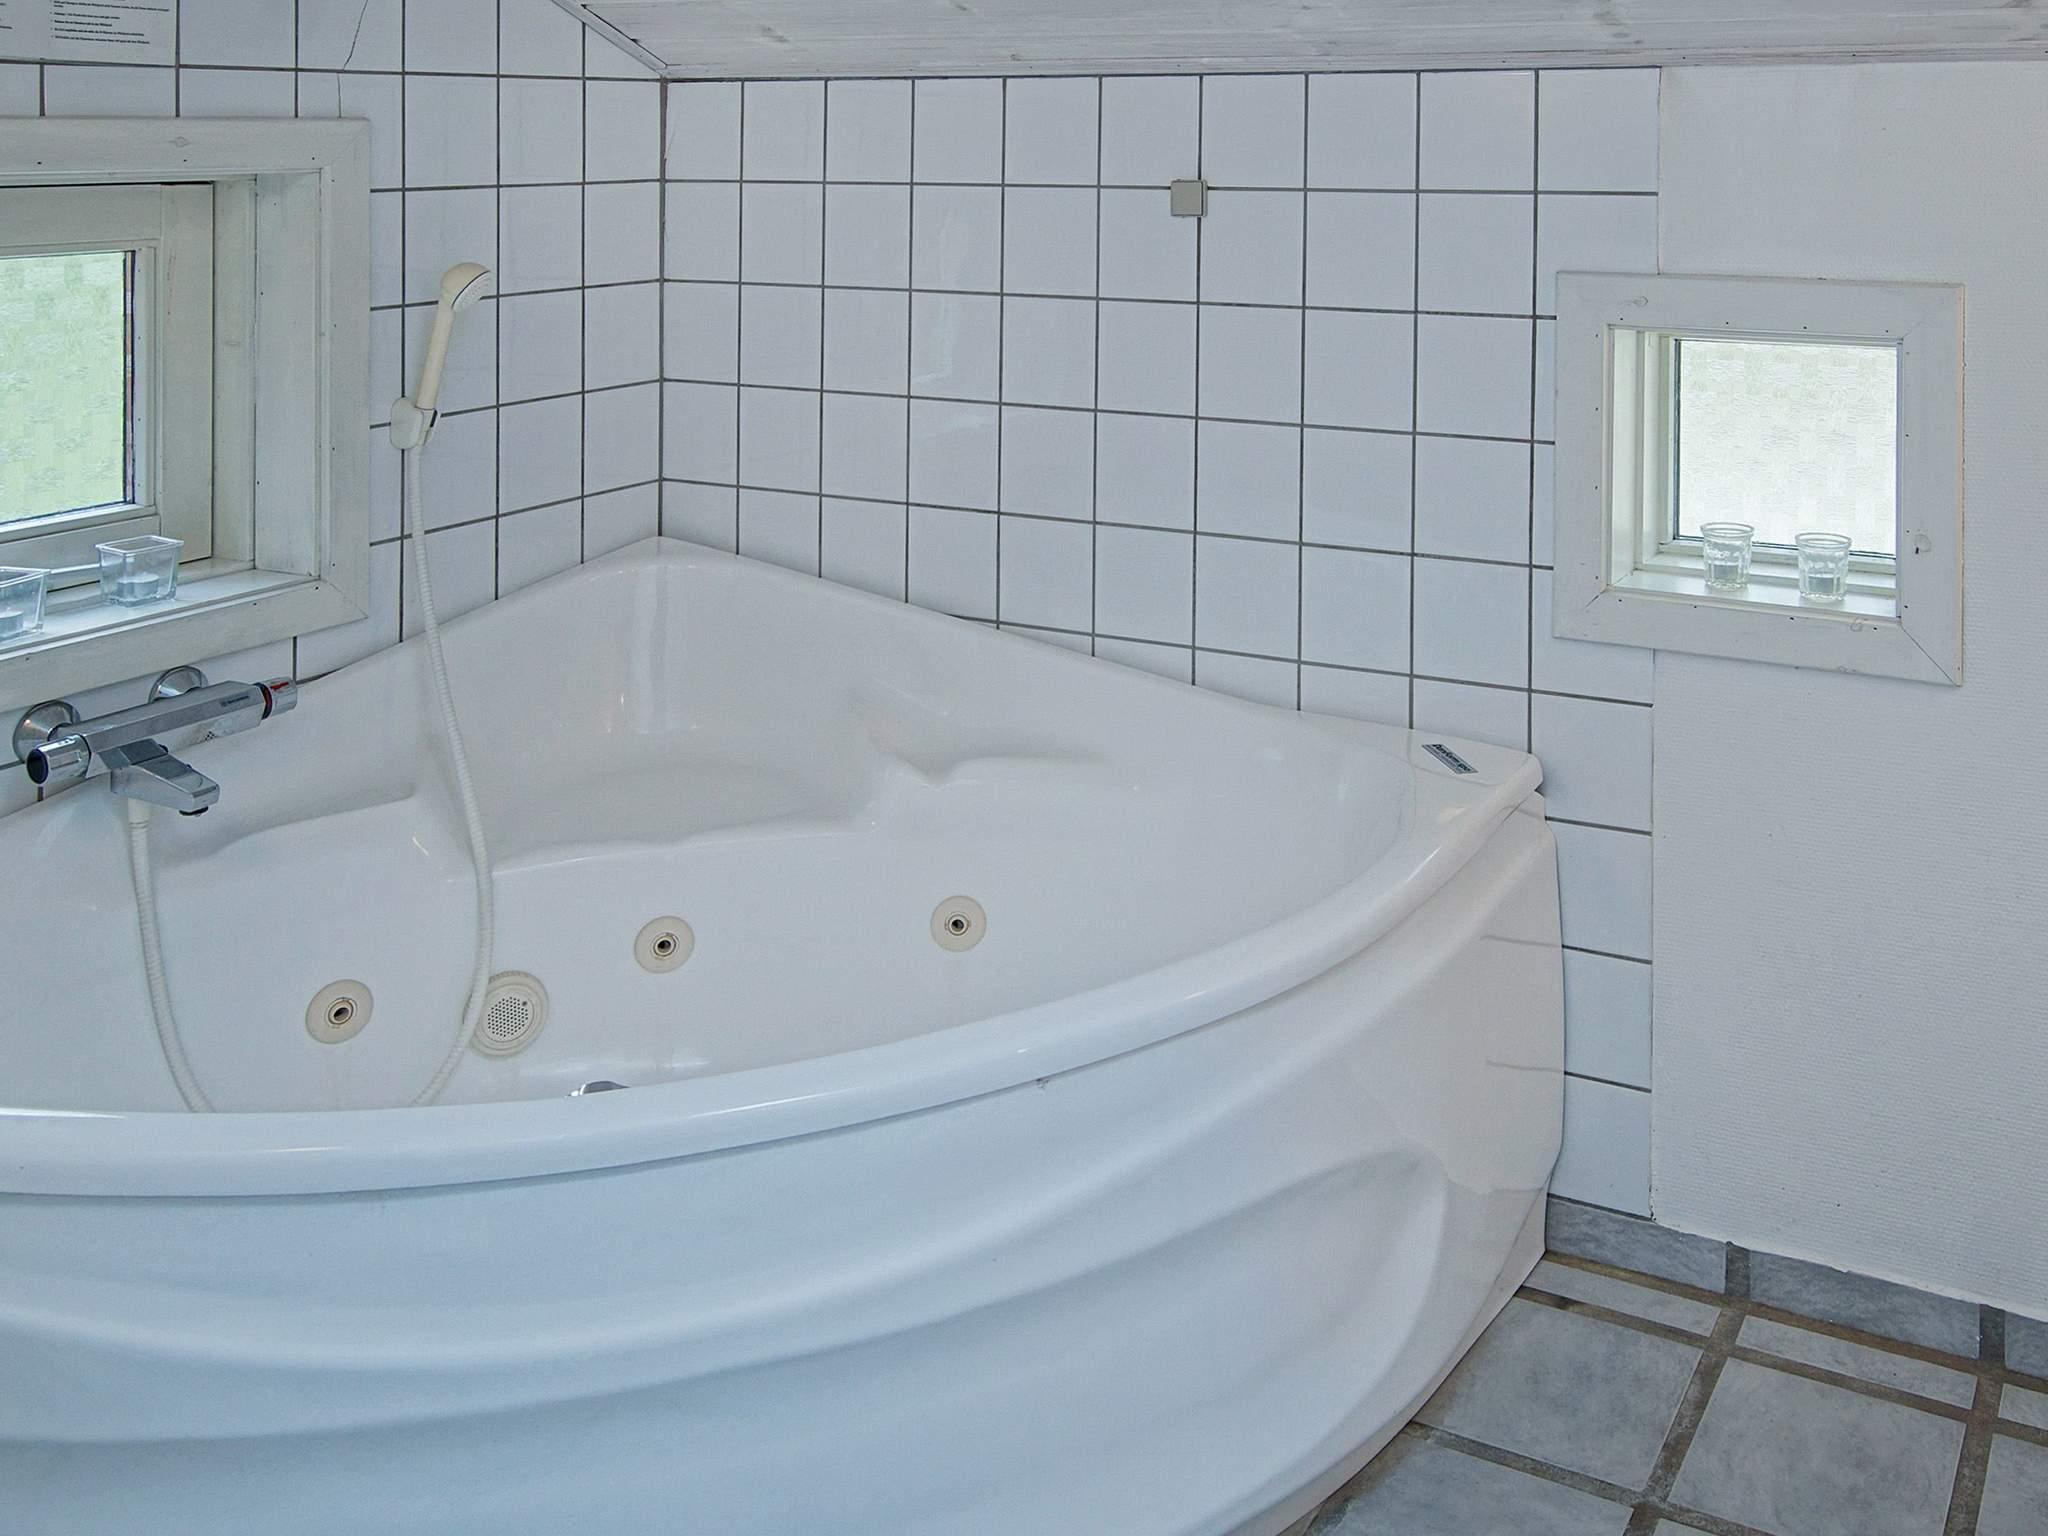 Ferienhaus Sommerodde (82550), Nexø, , Bornholm, Dänemark, Bild 17